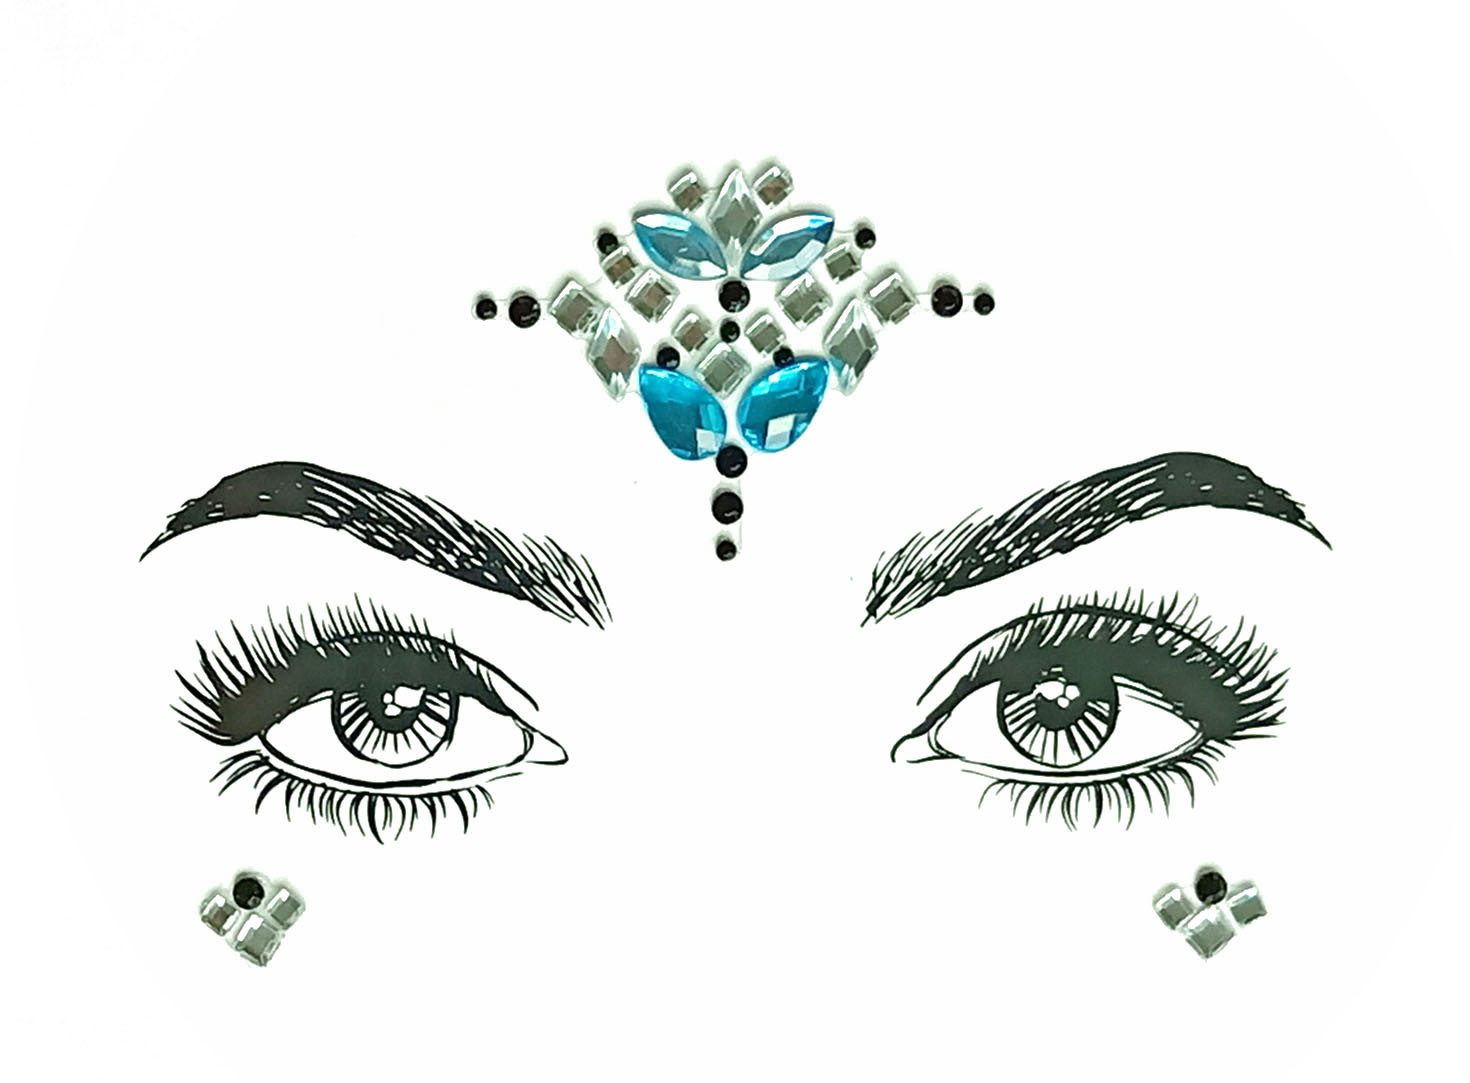 83a479c010 Christmas DIY Eyebrow Face Body Art Adhesive Crystal Glitter Jewels  Festival Party Eye Tattoo Stickers Makeup Xmas Decor Temporary Lip Tattoos  ...